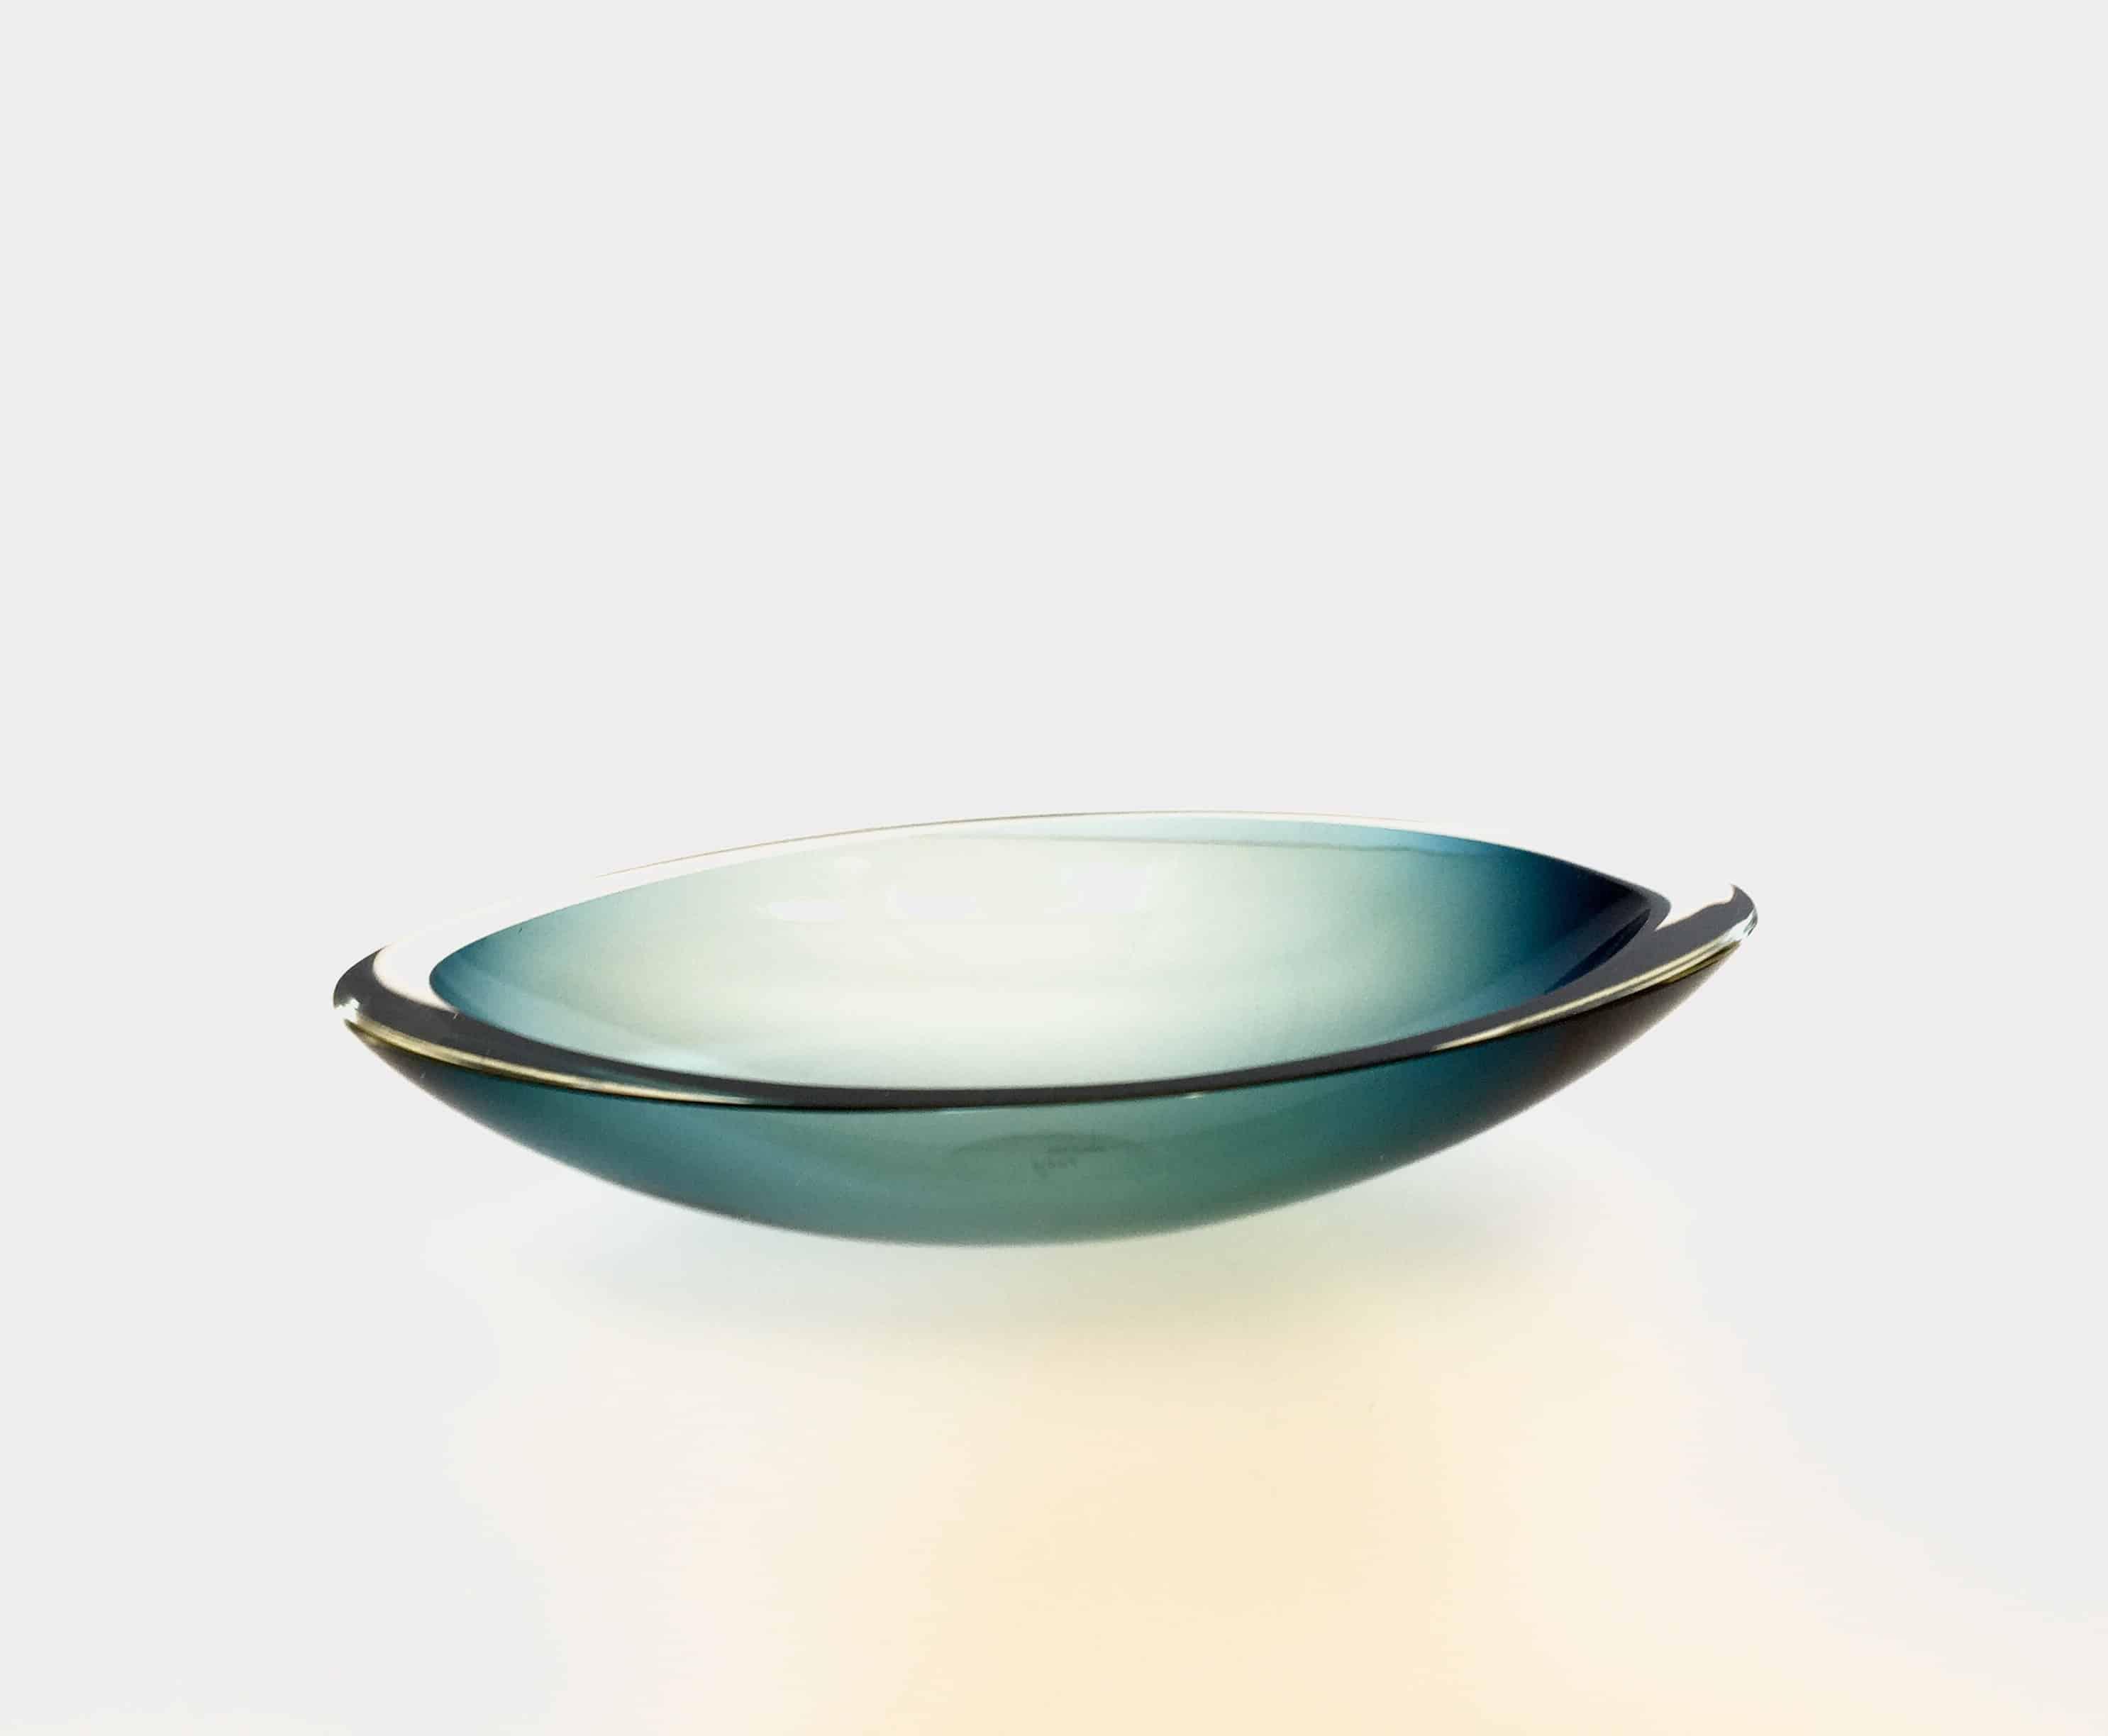 Andrea-Fiebig-bowl-image-blue